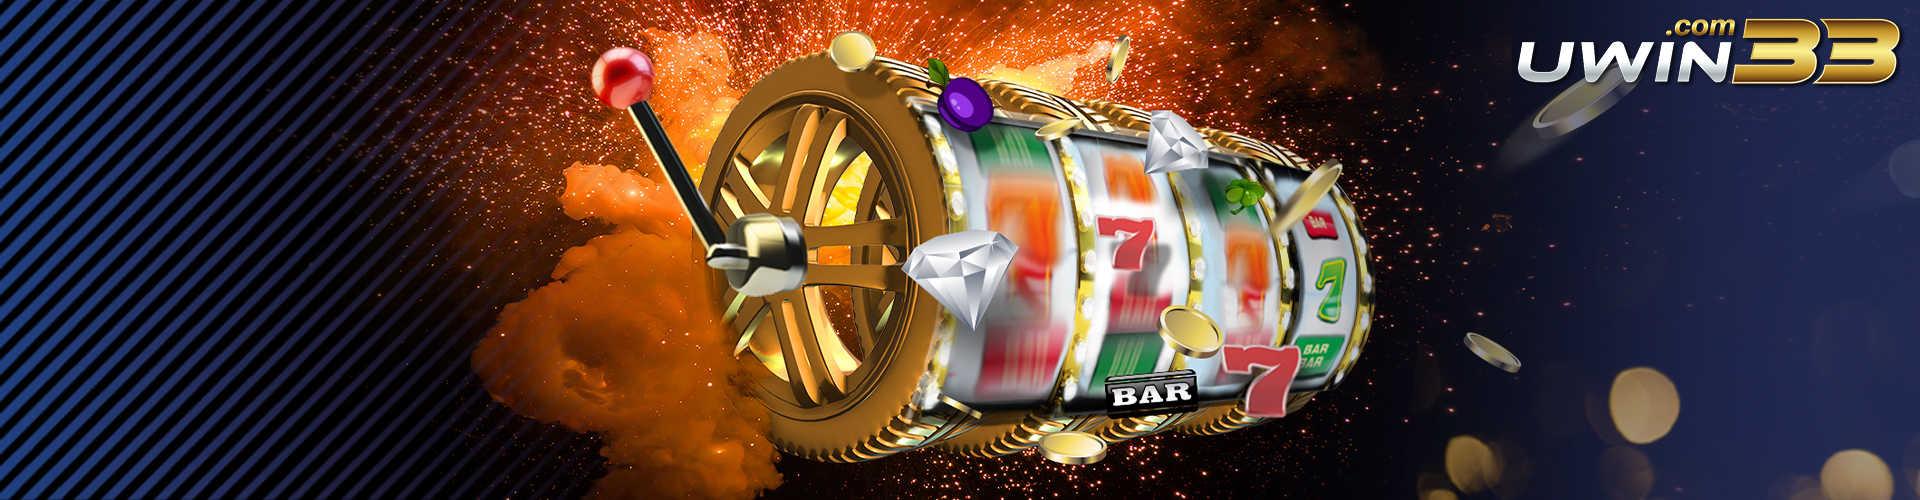 UWin33 Casino Table Games